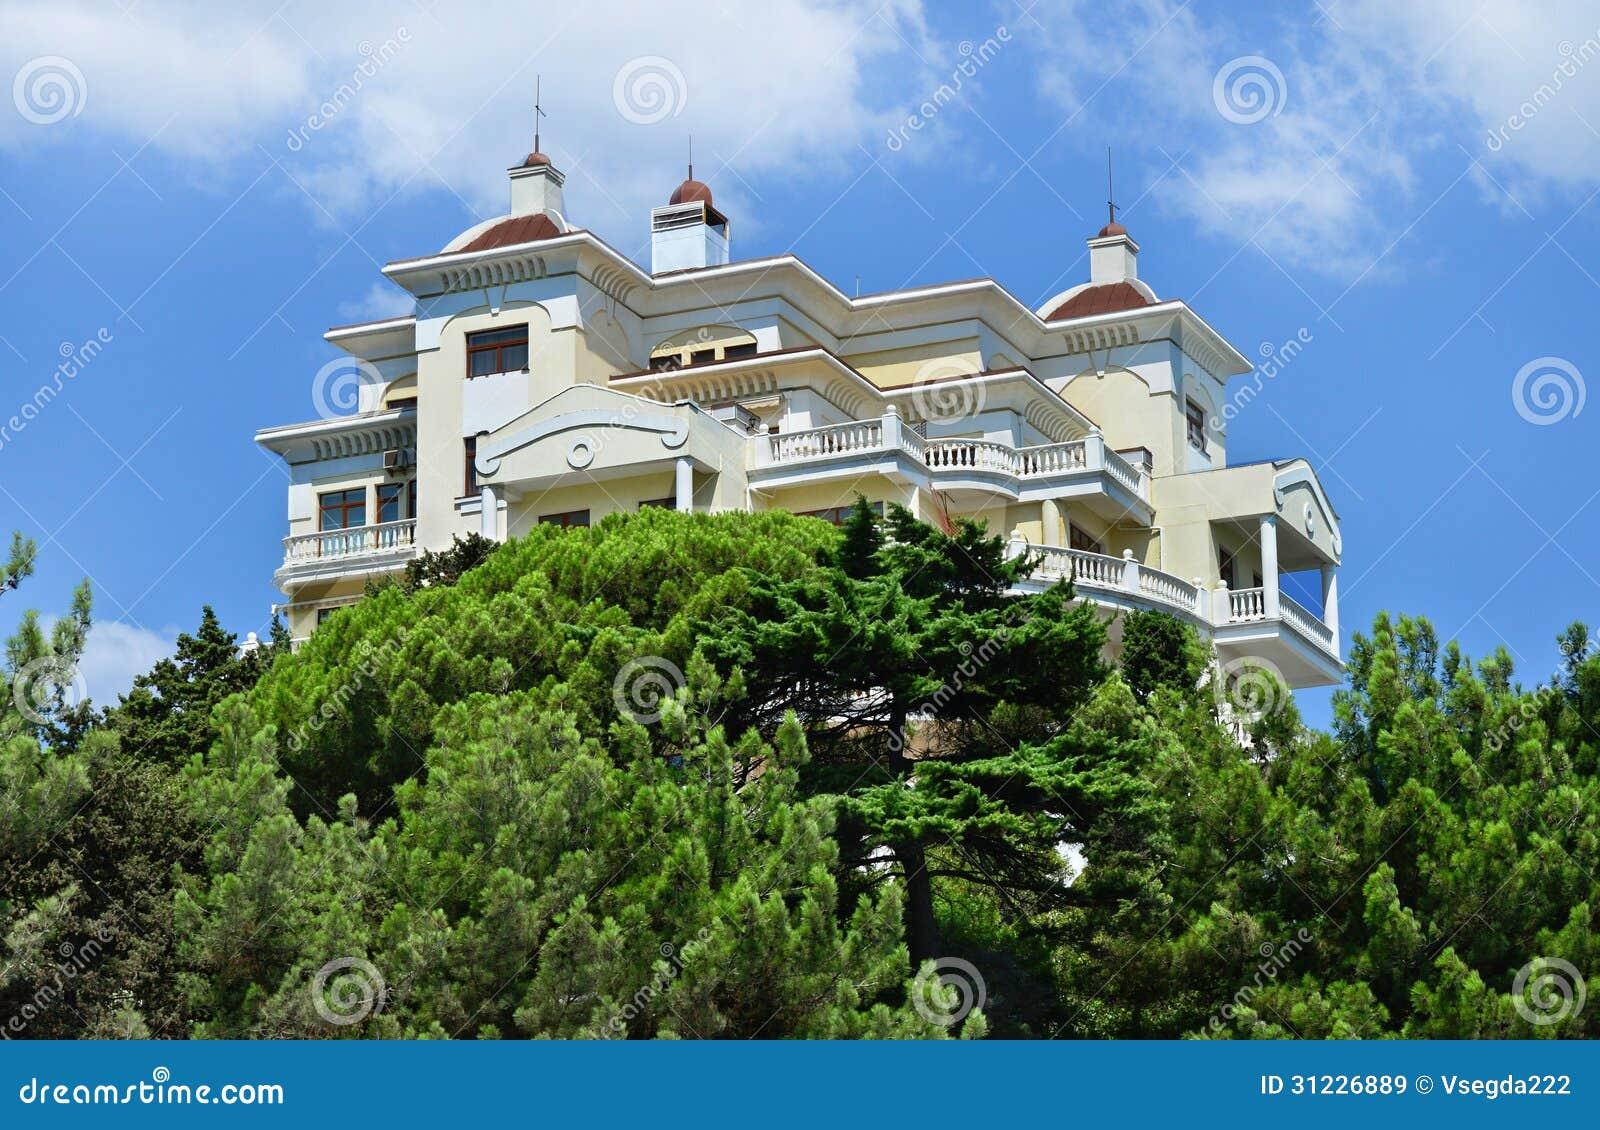 Mooi modern huis hotel yalta de krim stock afbeelding afbeelding 31226889 - Foto modern huis ...